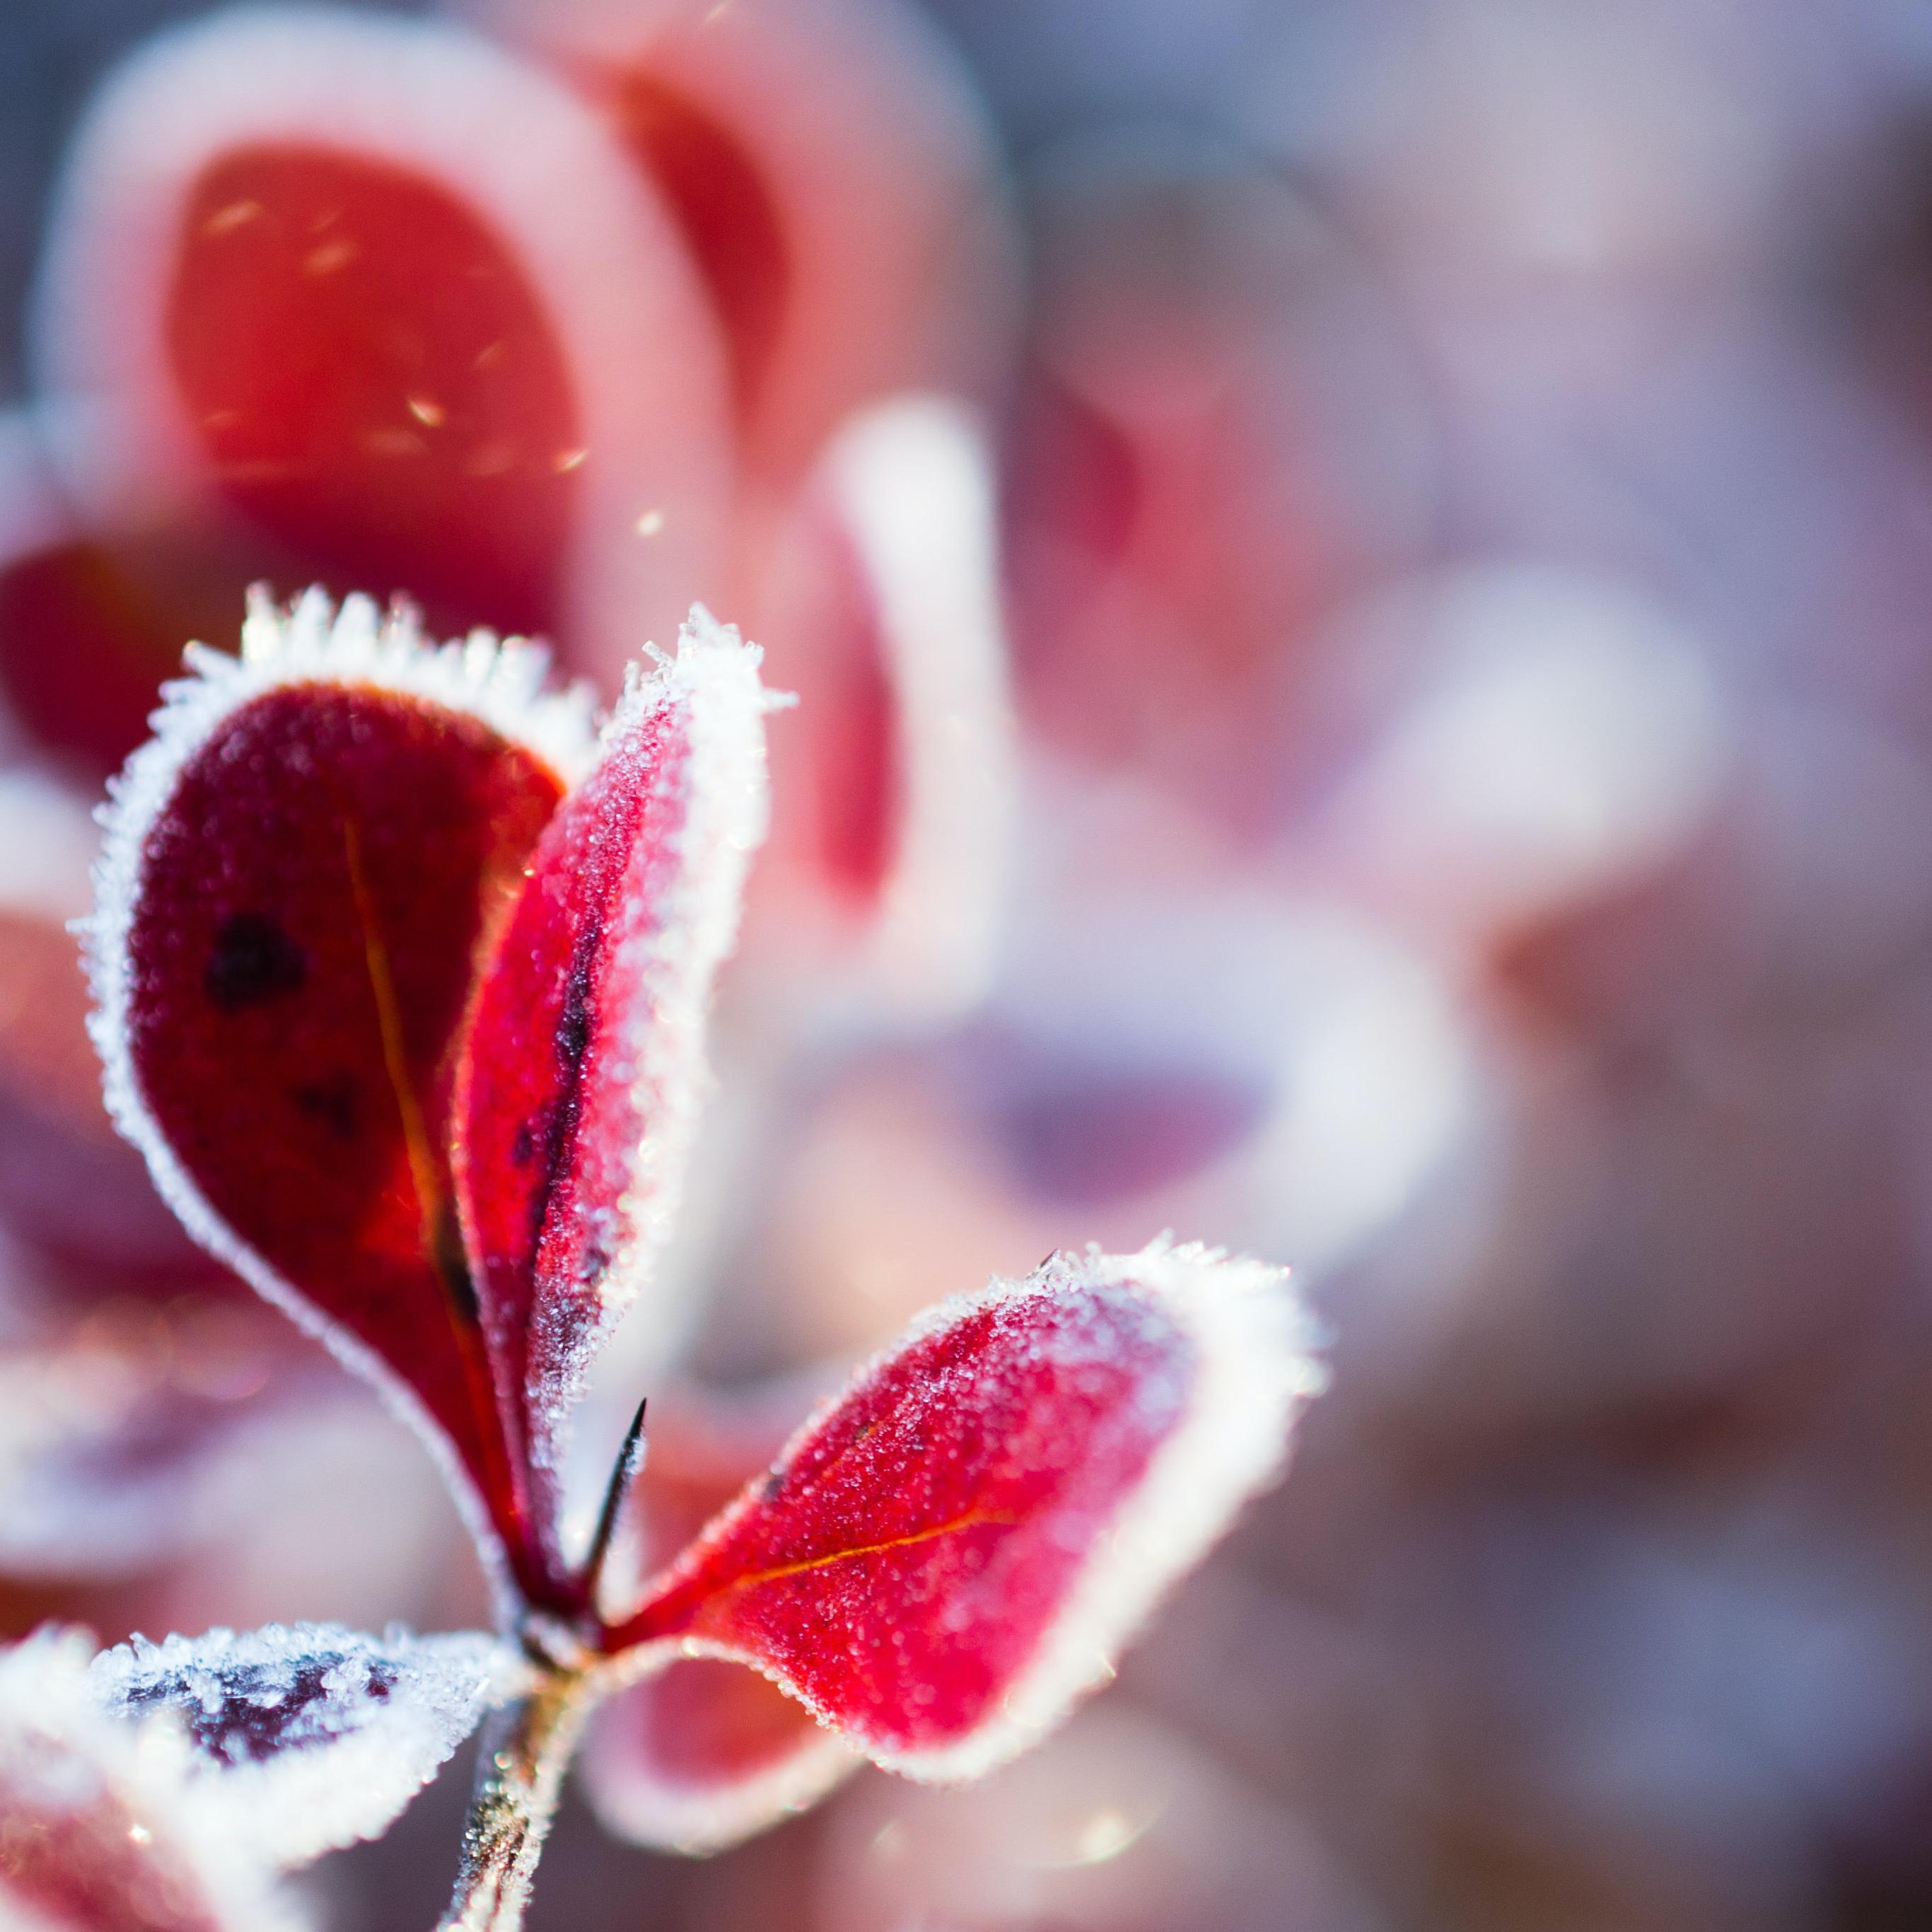 snow wallpaper frosted leaves idownloadblog unsplash austris augusts iPad